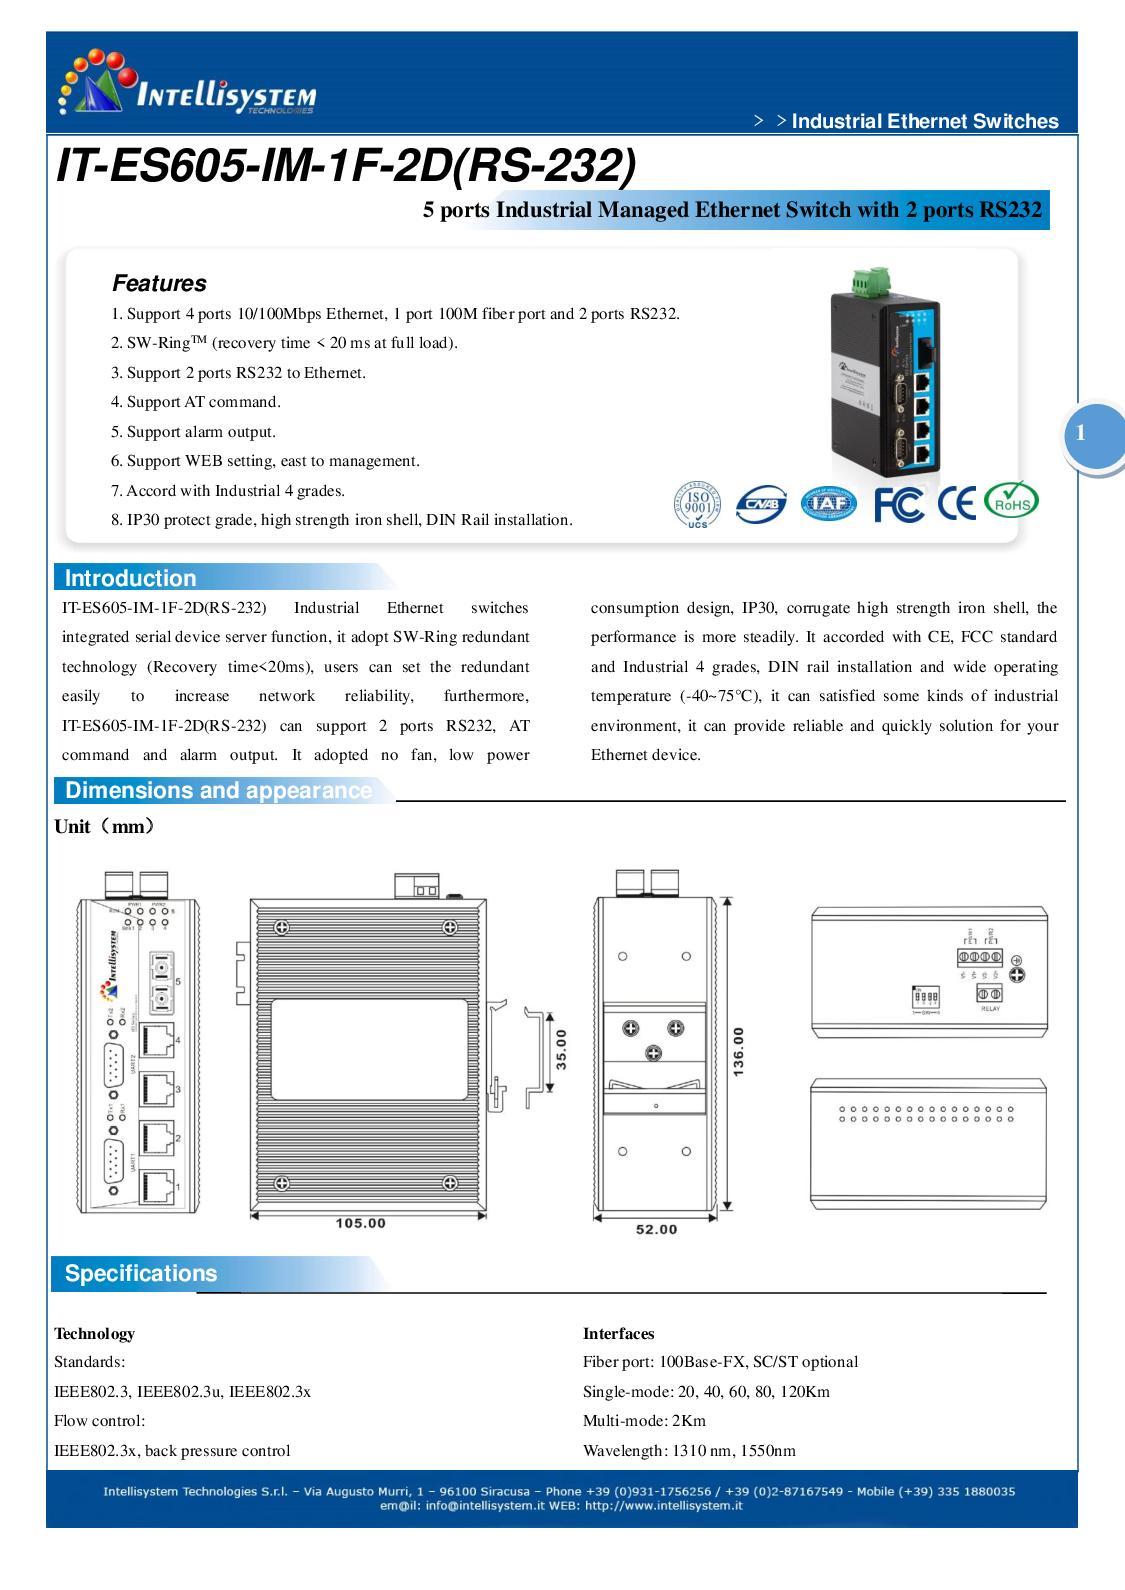 Calaméo - IT-ES605-IM-1F-2D(RS-232) - Industrial Ethernet Managed